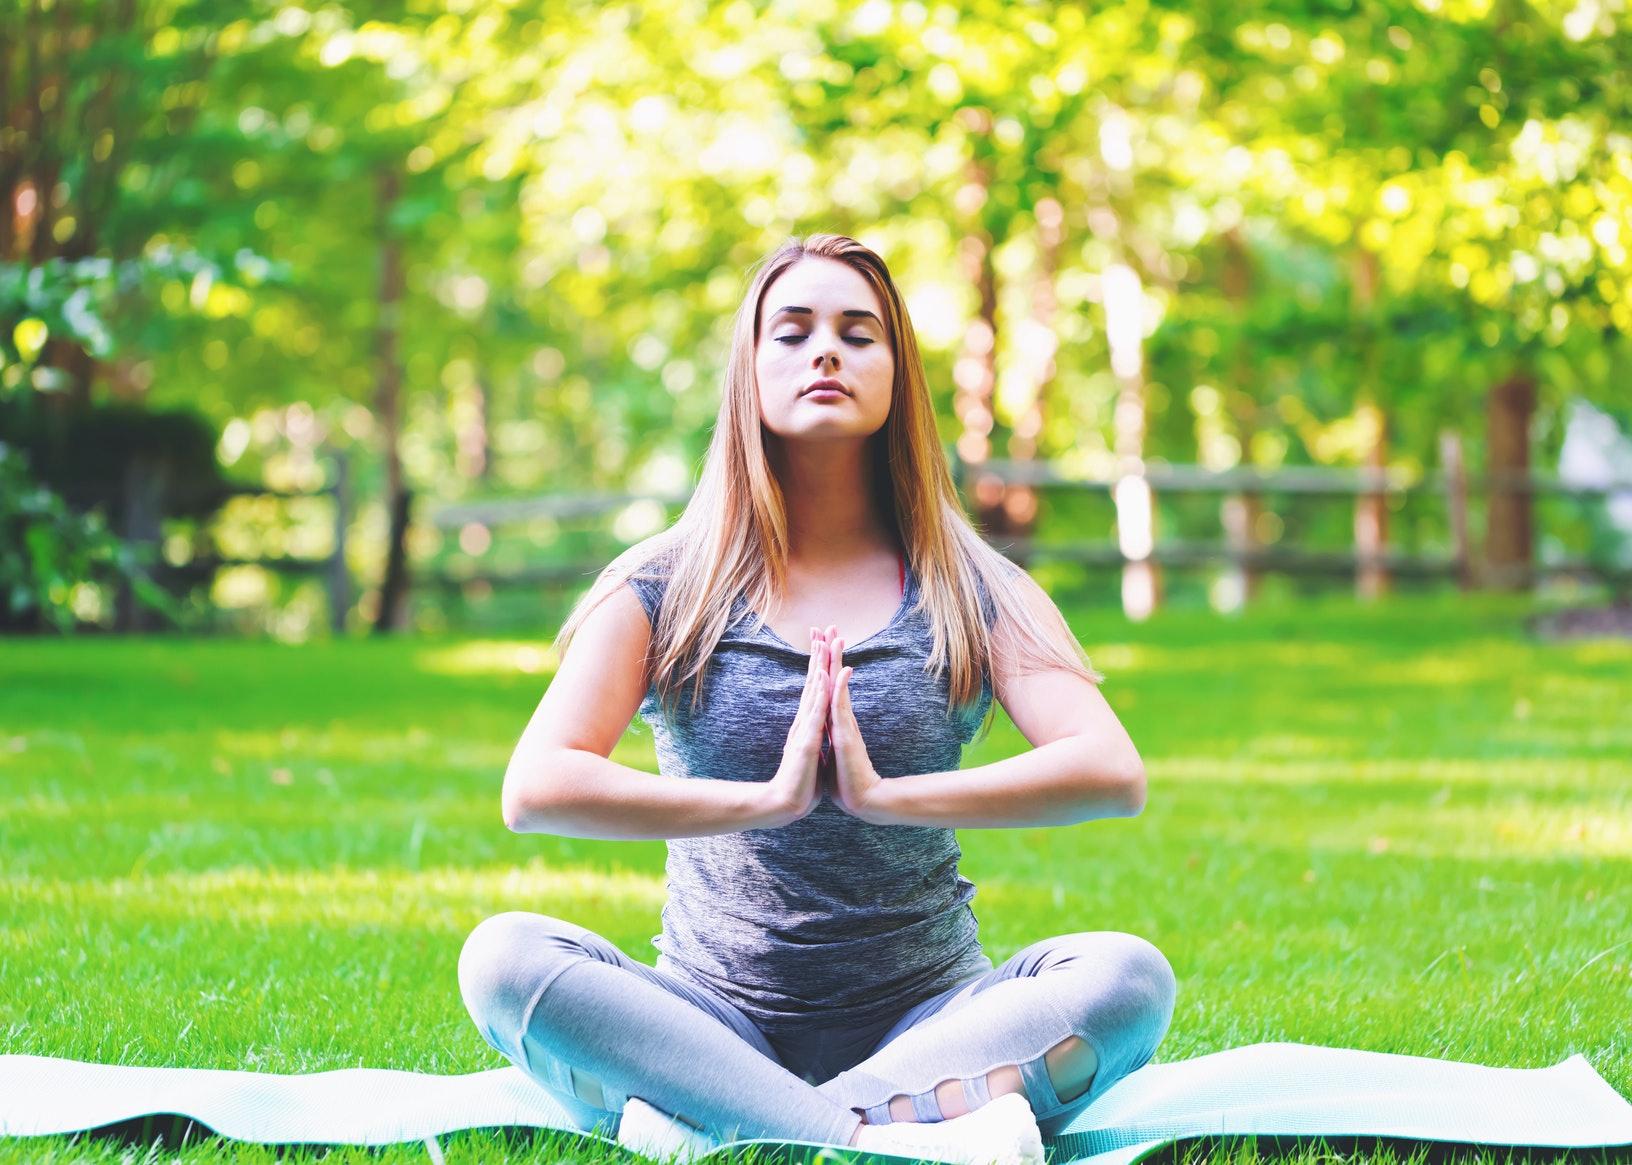 Starting yoga at 50